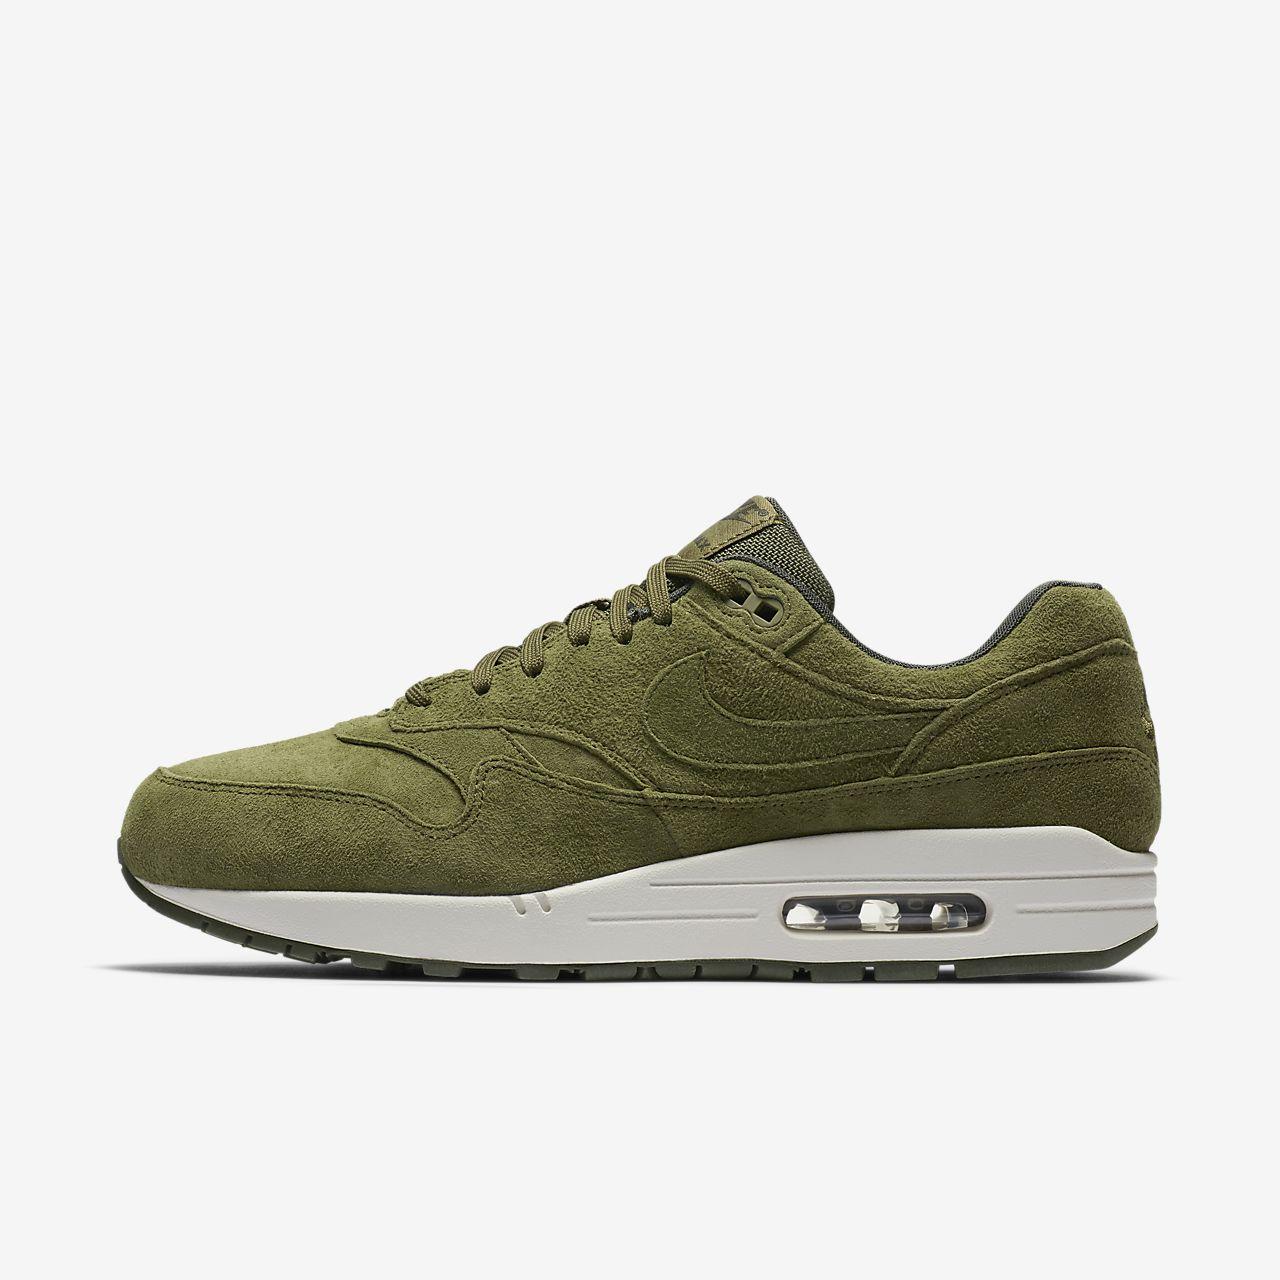 sports shoes d9627 423eb ... Scarpa Nike Air Max 1 Premium - Uomo